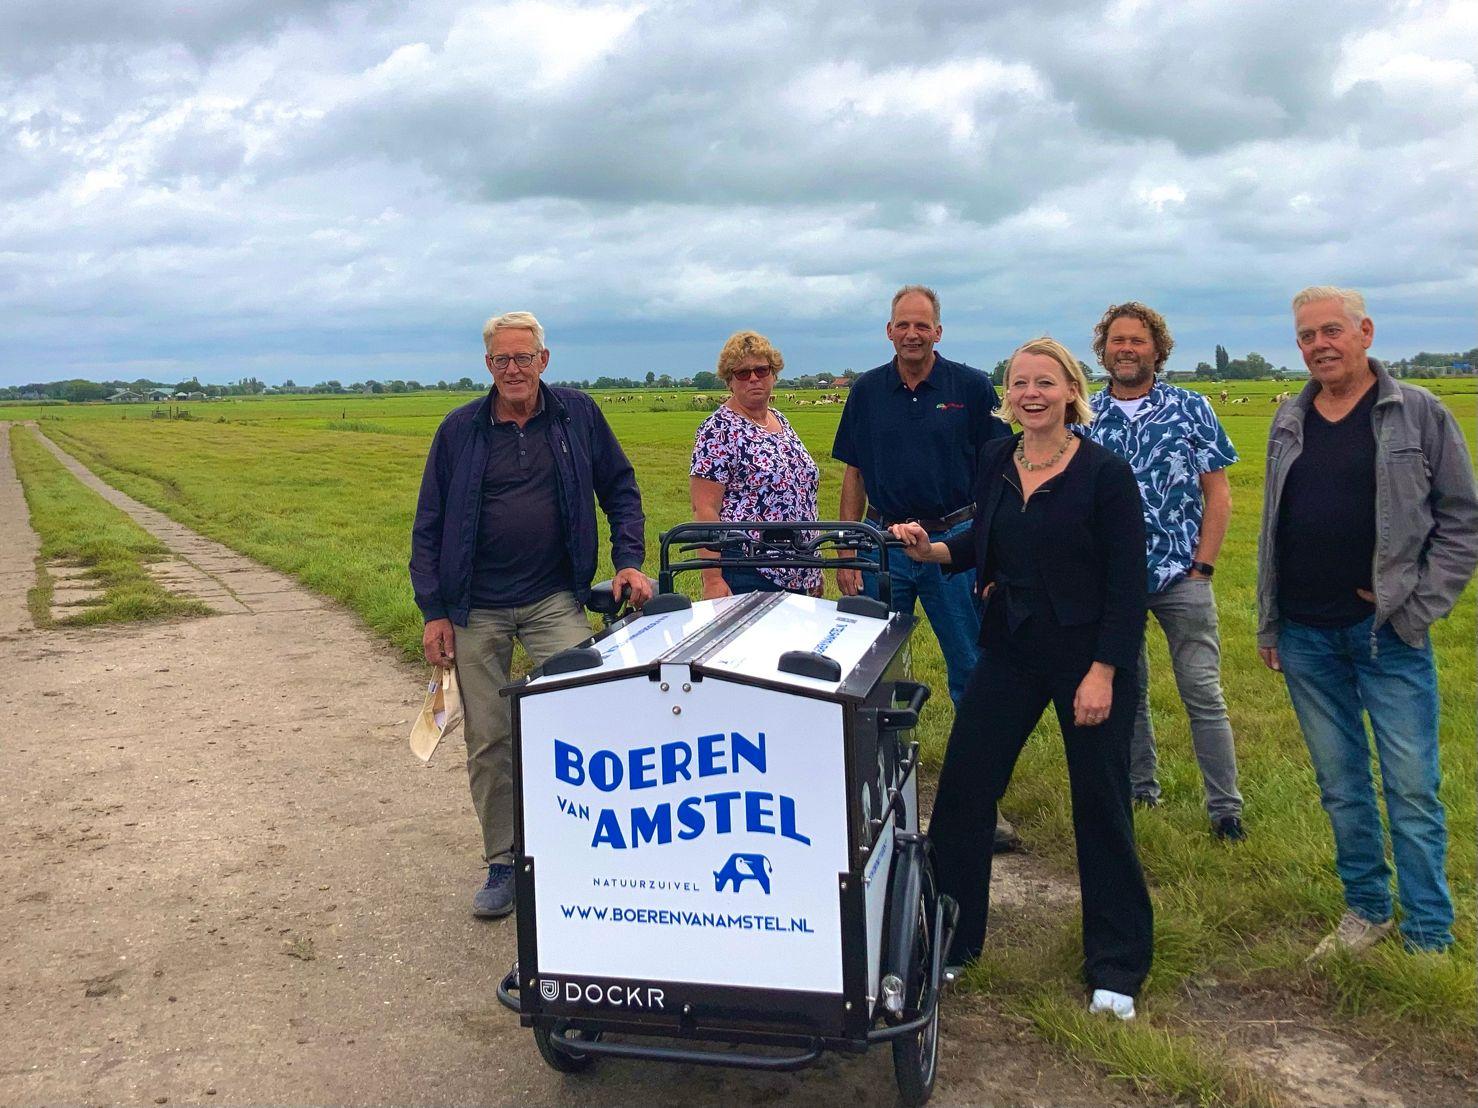 https://www.boerenvanamstel.nl/wp-content/uploads/2021/09/lokale-melk-amstelveen.jpeg